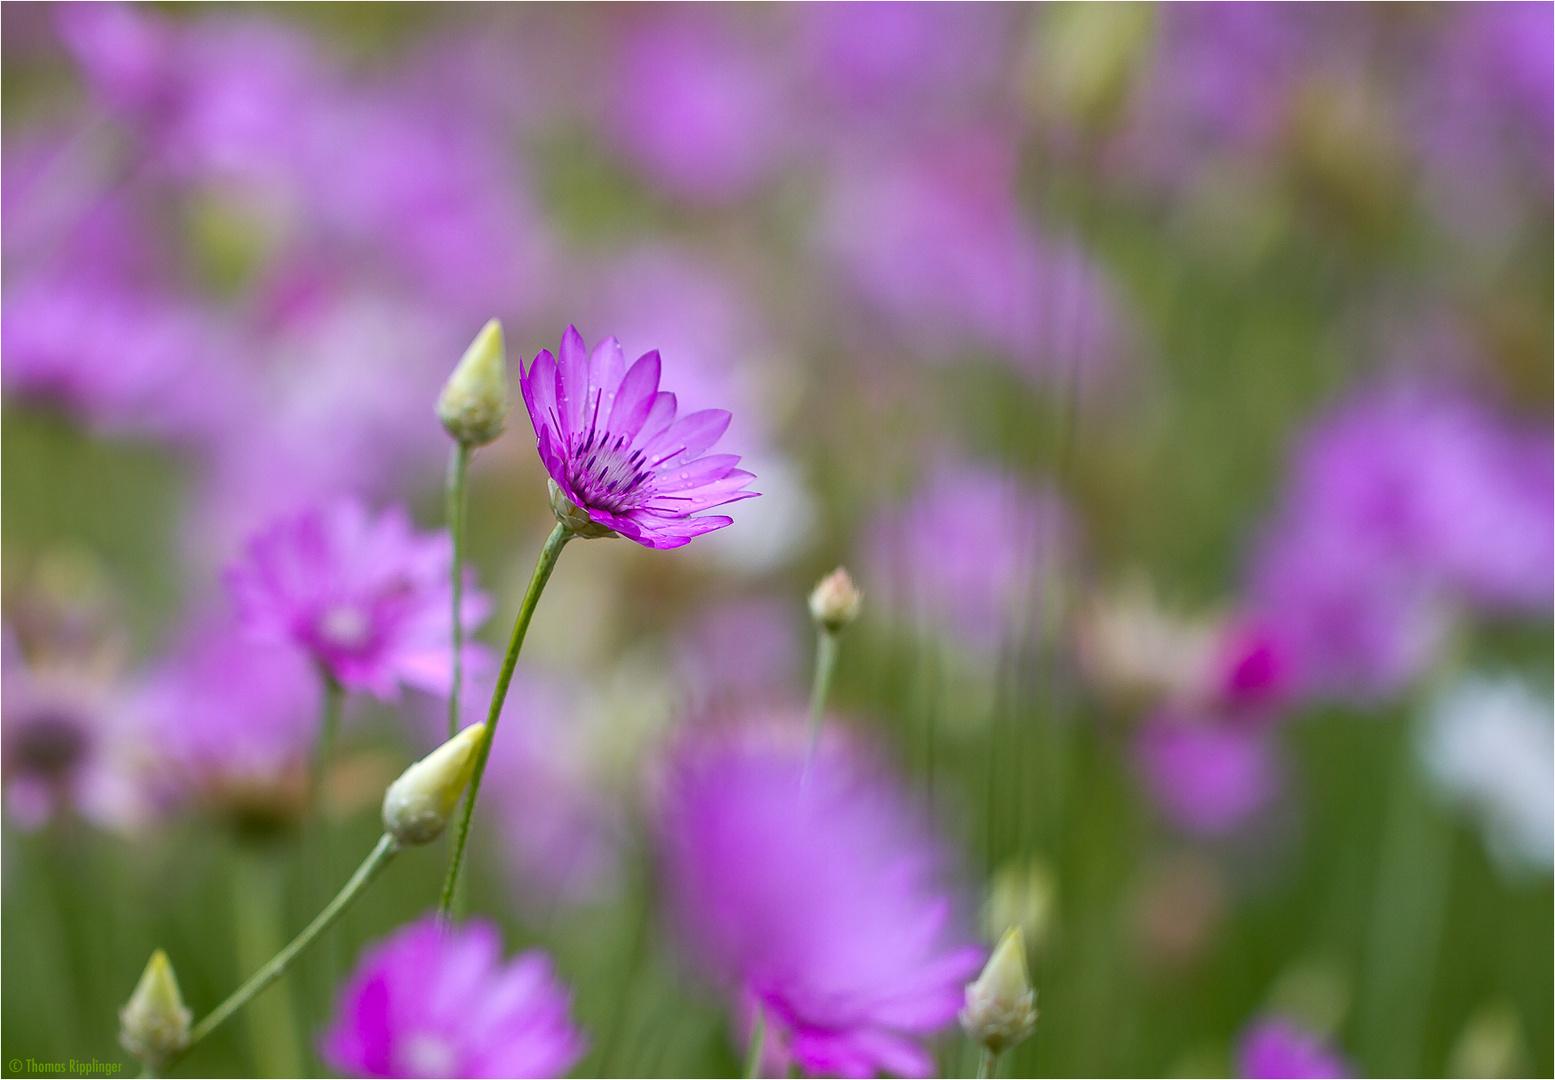 Papierblume (Xeranthemum annuum)